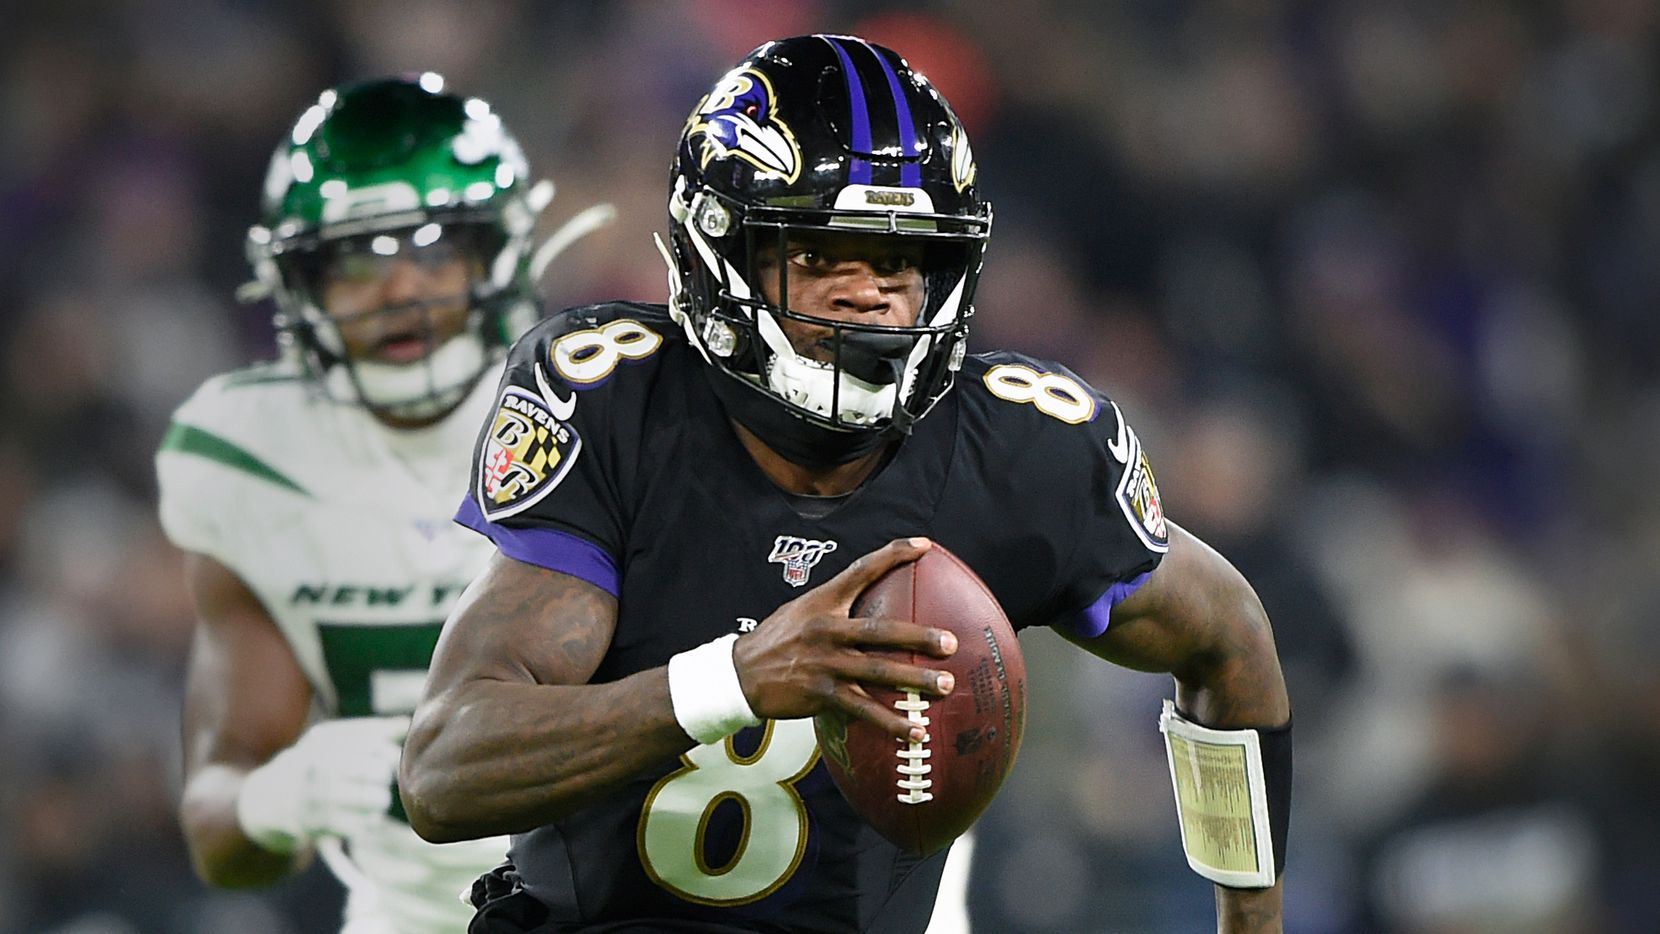 Dec. 12, 2019: Ravens quarterback Lamar Jackson (8) runs past New York Jets linebacker Brandon Copeland (51) during an NFL football game. (AP Photo/Gail Burton, File)